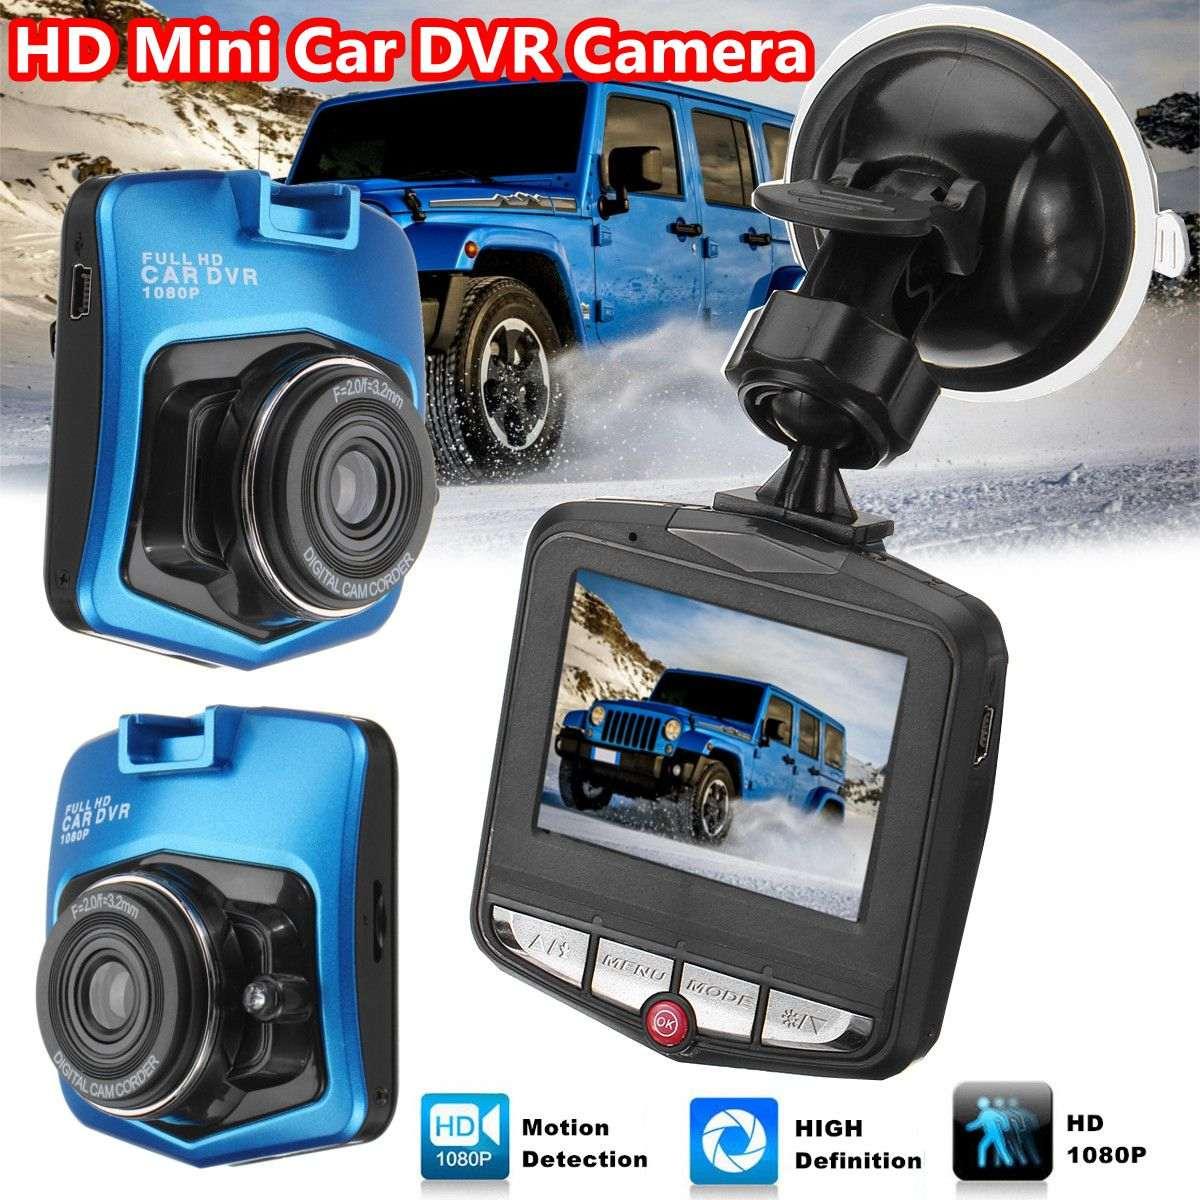 все цены на 2.4 Inch LCD 1080P Full HD Car Camera Dual Lens Dashcam DVR Parking Monitoring Recorder Video Camcorder 170 Degree Wide Angel онлайн